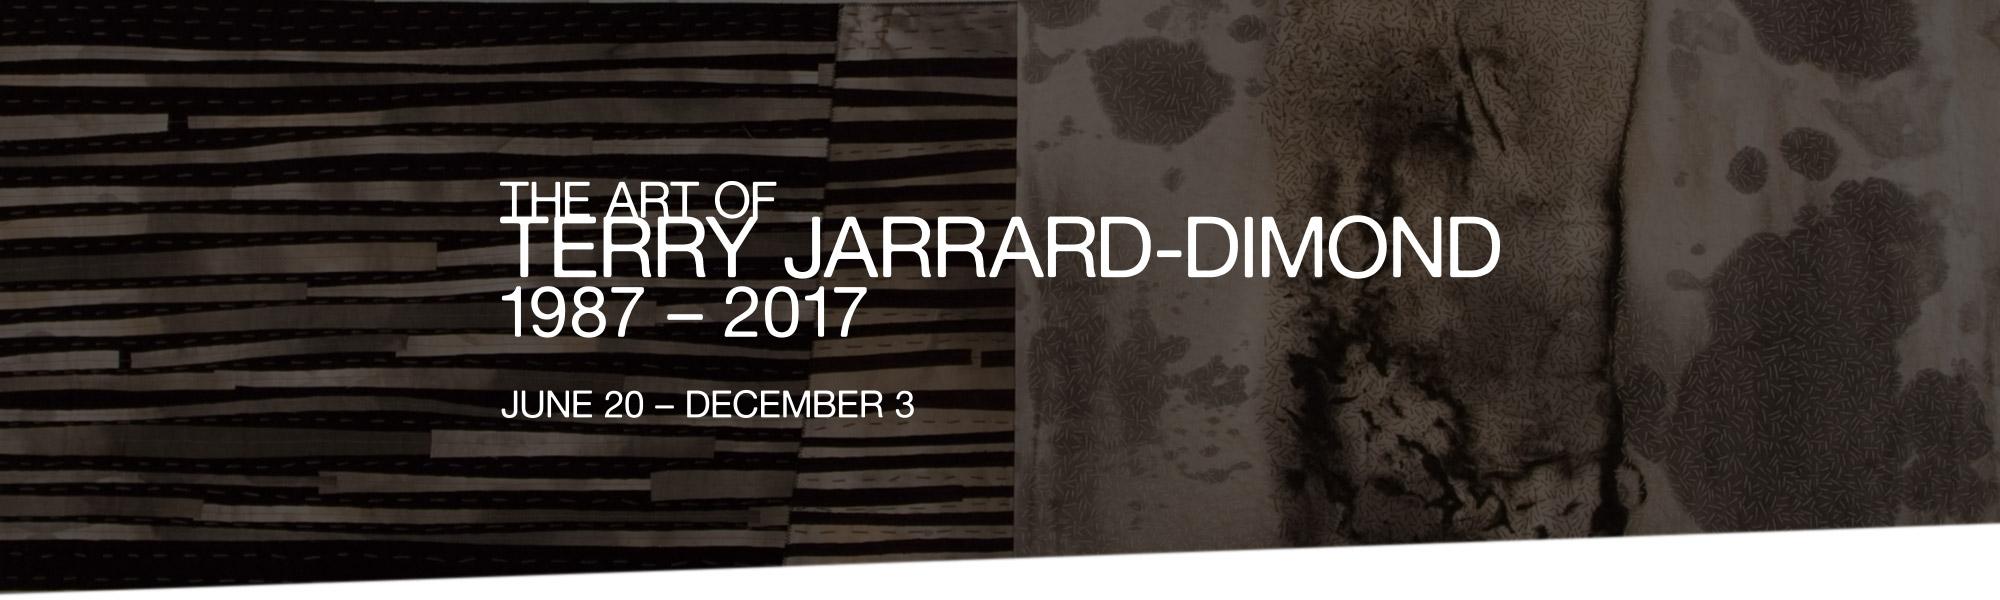 The Art of Terry Jarrard-Dimond